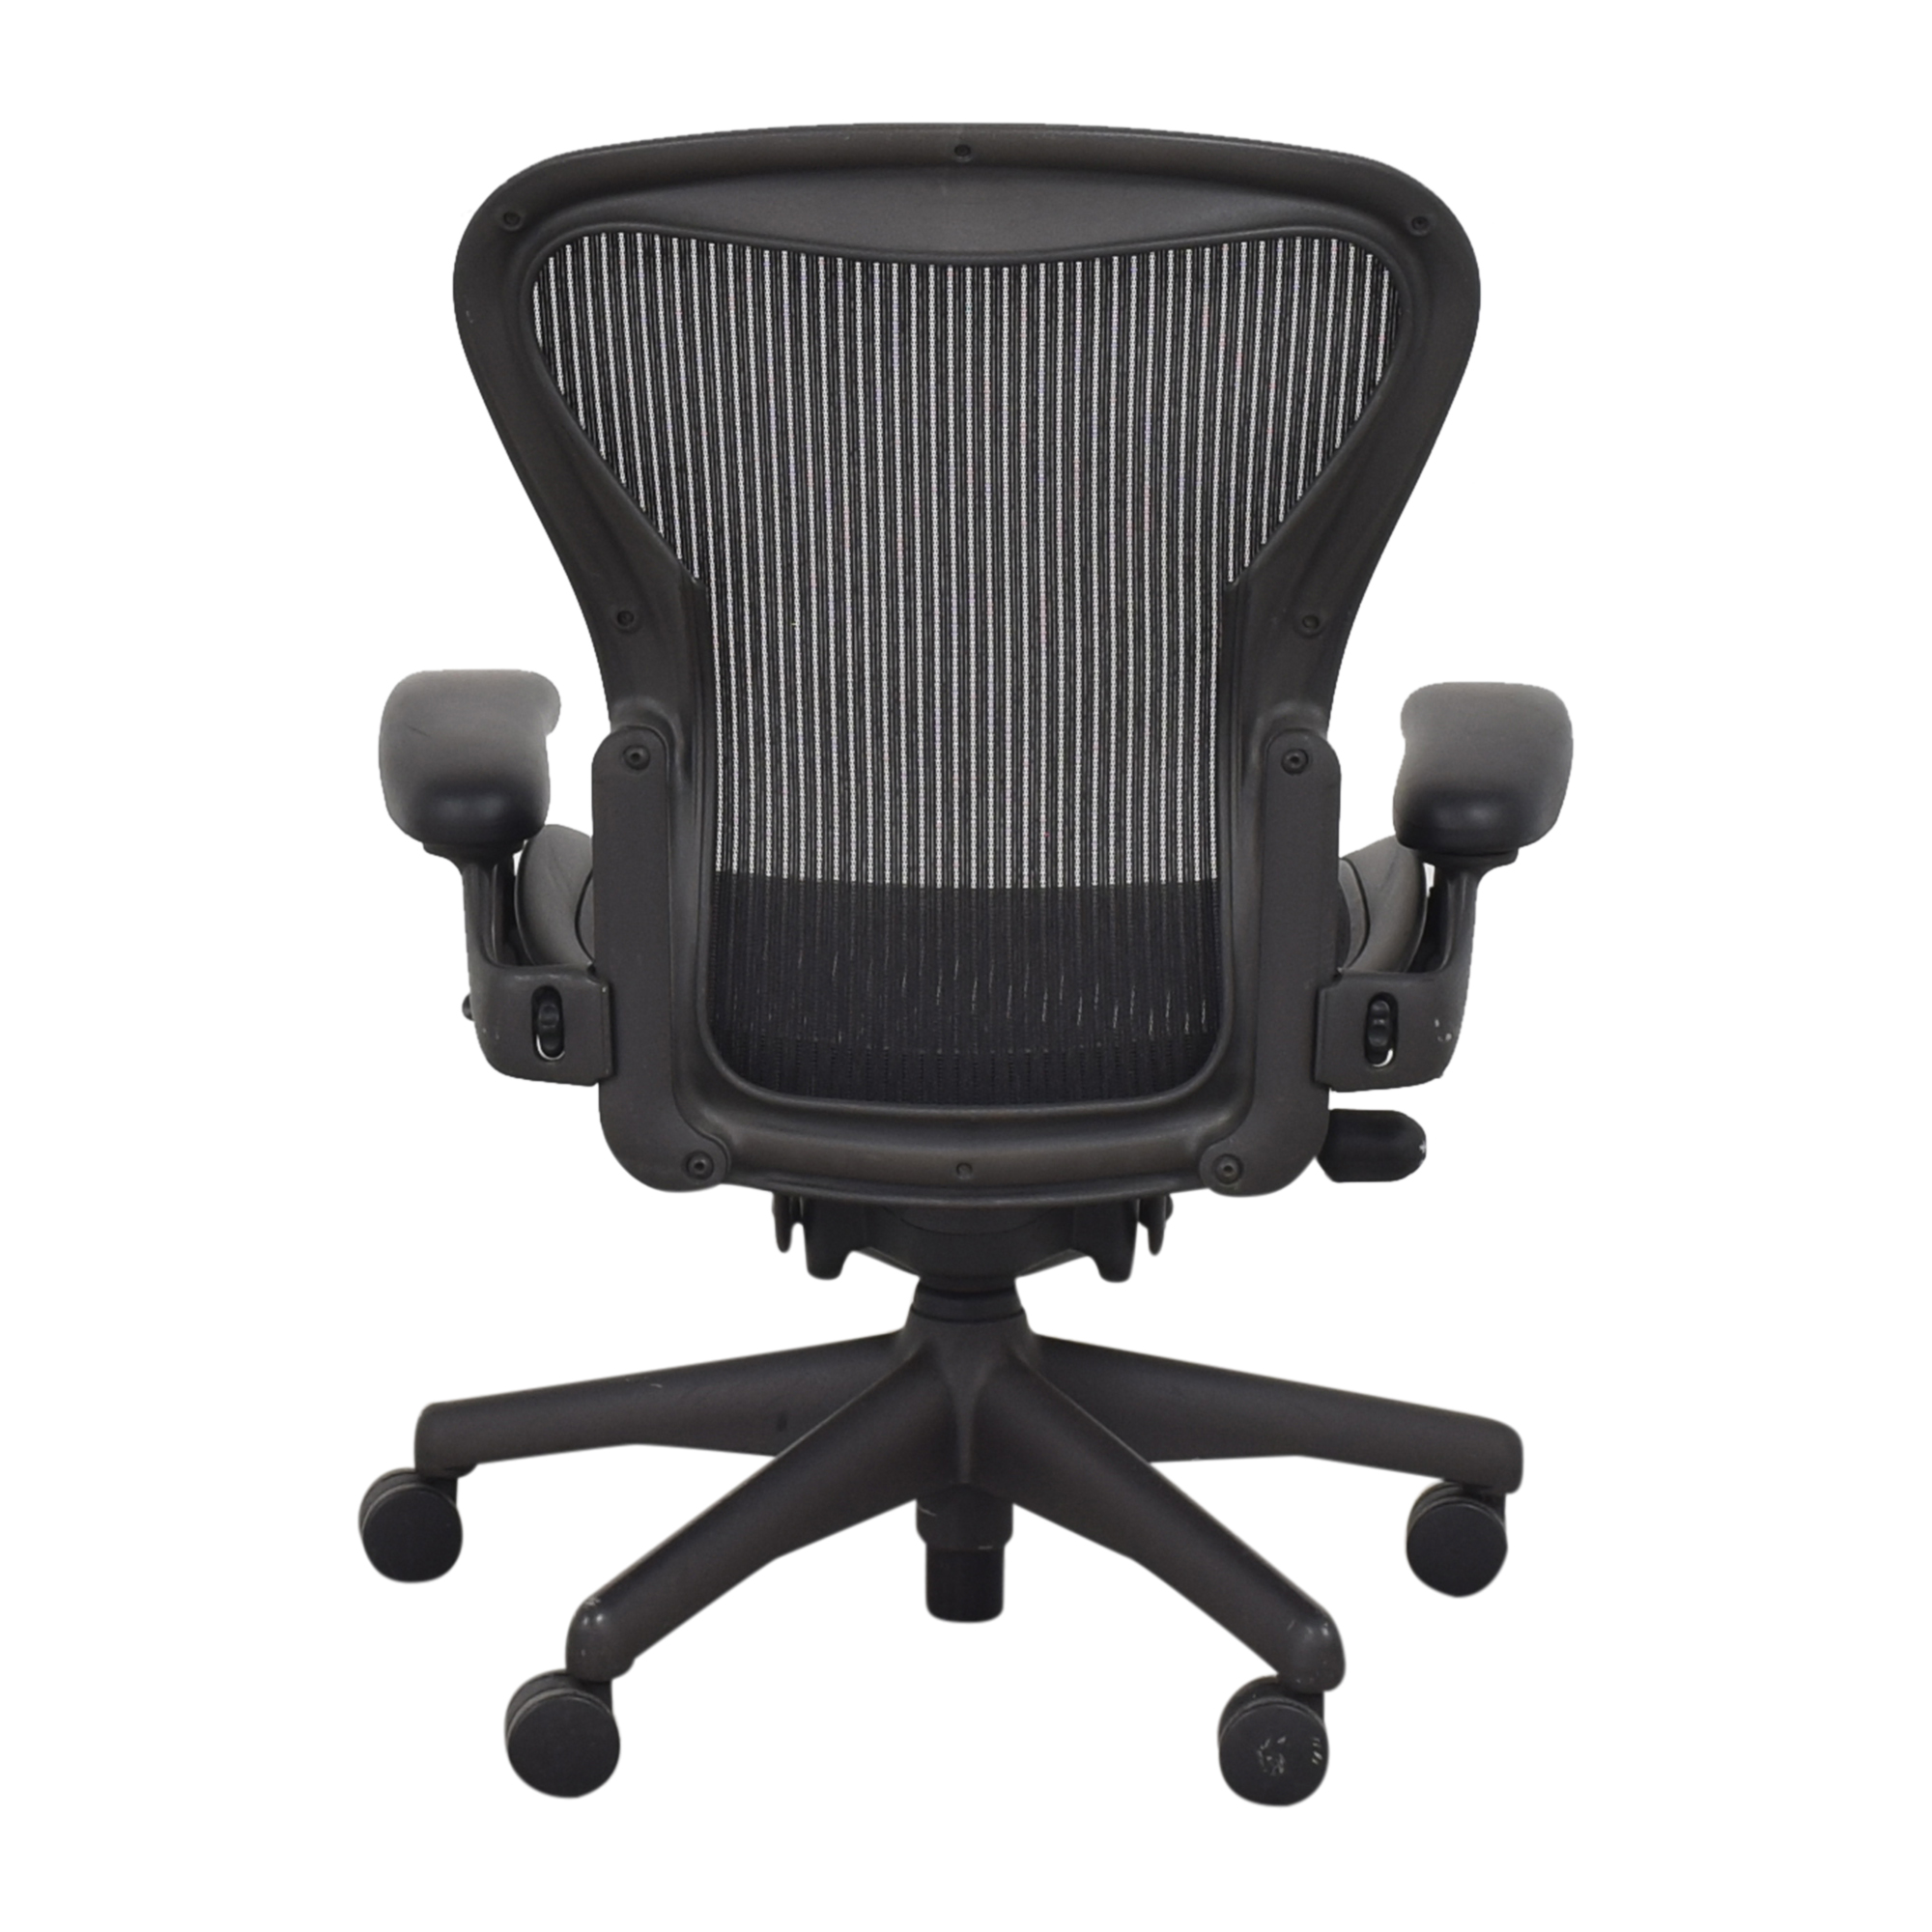 Herman Miller Herman Miller Aeron Size B Swivel Desk Chair Chairs